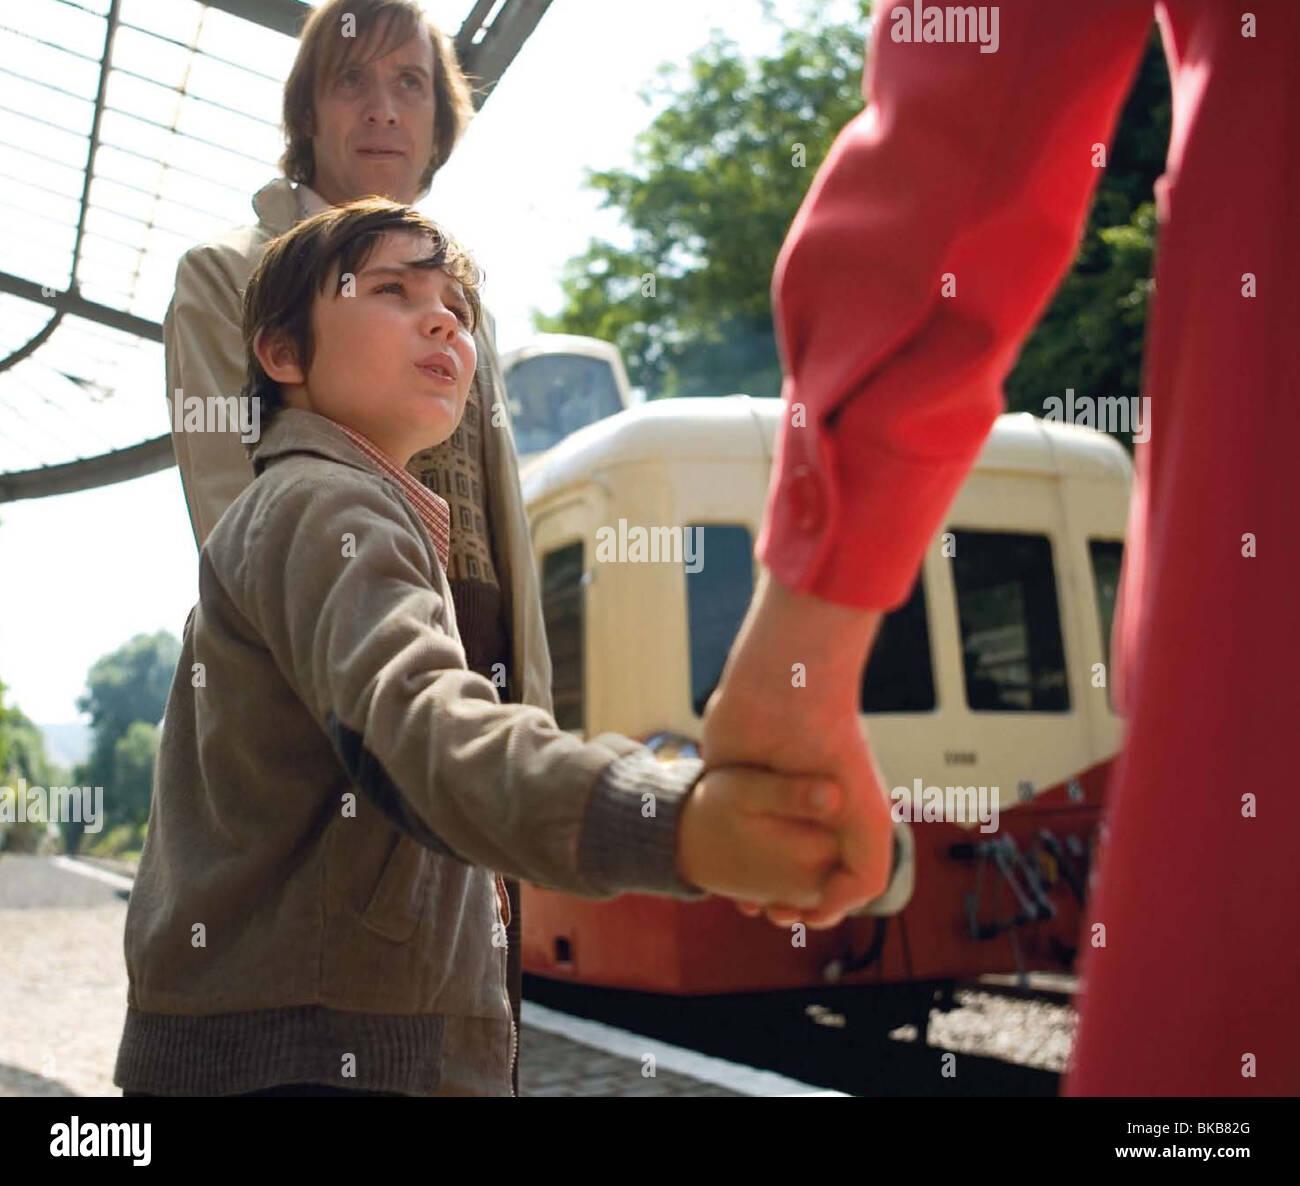 Mr. Nobody Year : 2009 Director : Jaco van Dormael Rhys Ifans, Thomas Byrne - Stock Image